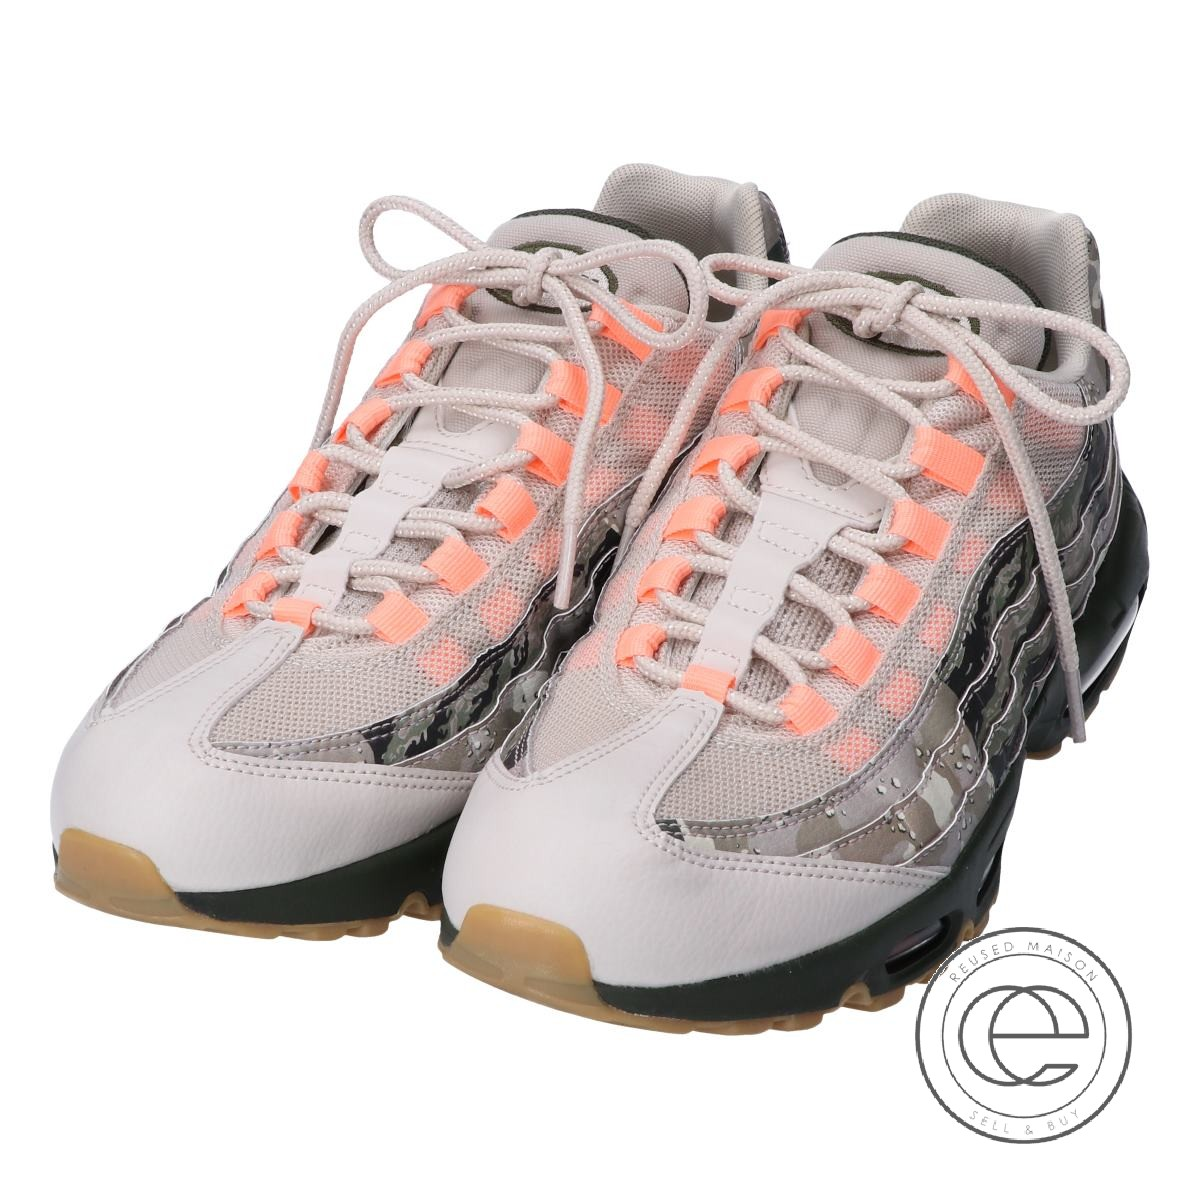 NIKE Nike AQ6303 001 AIR MAX 95 ESSENTIAL Air Max 95 essential sneakers shoes 27 CAMO(Desert SandSunset Tint) men